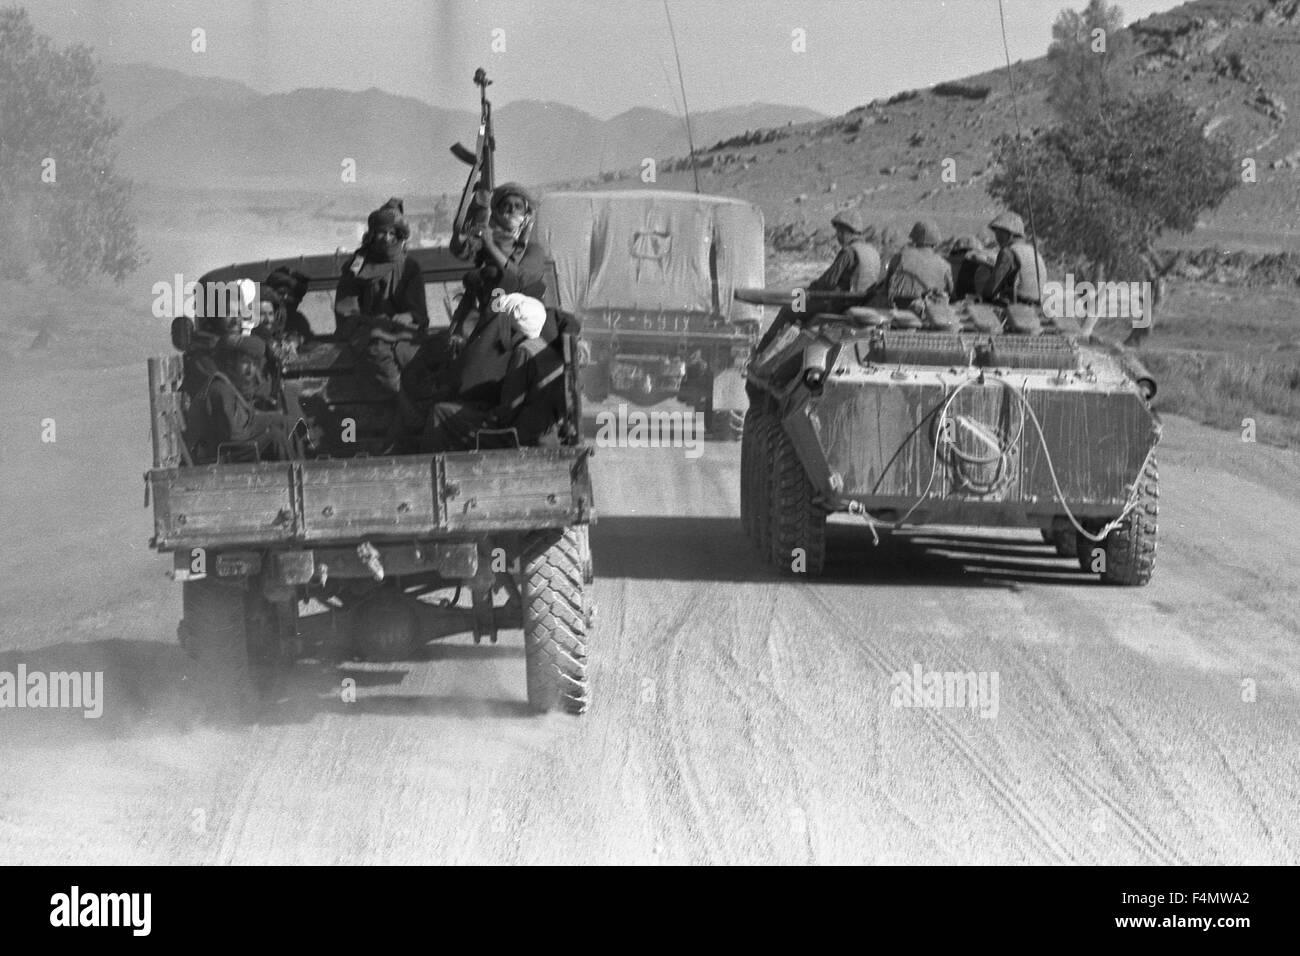 Soviet Afghanistan war - Page 6 Afghanistan-pushtuns-near-kandahar-F4MWA2